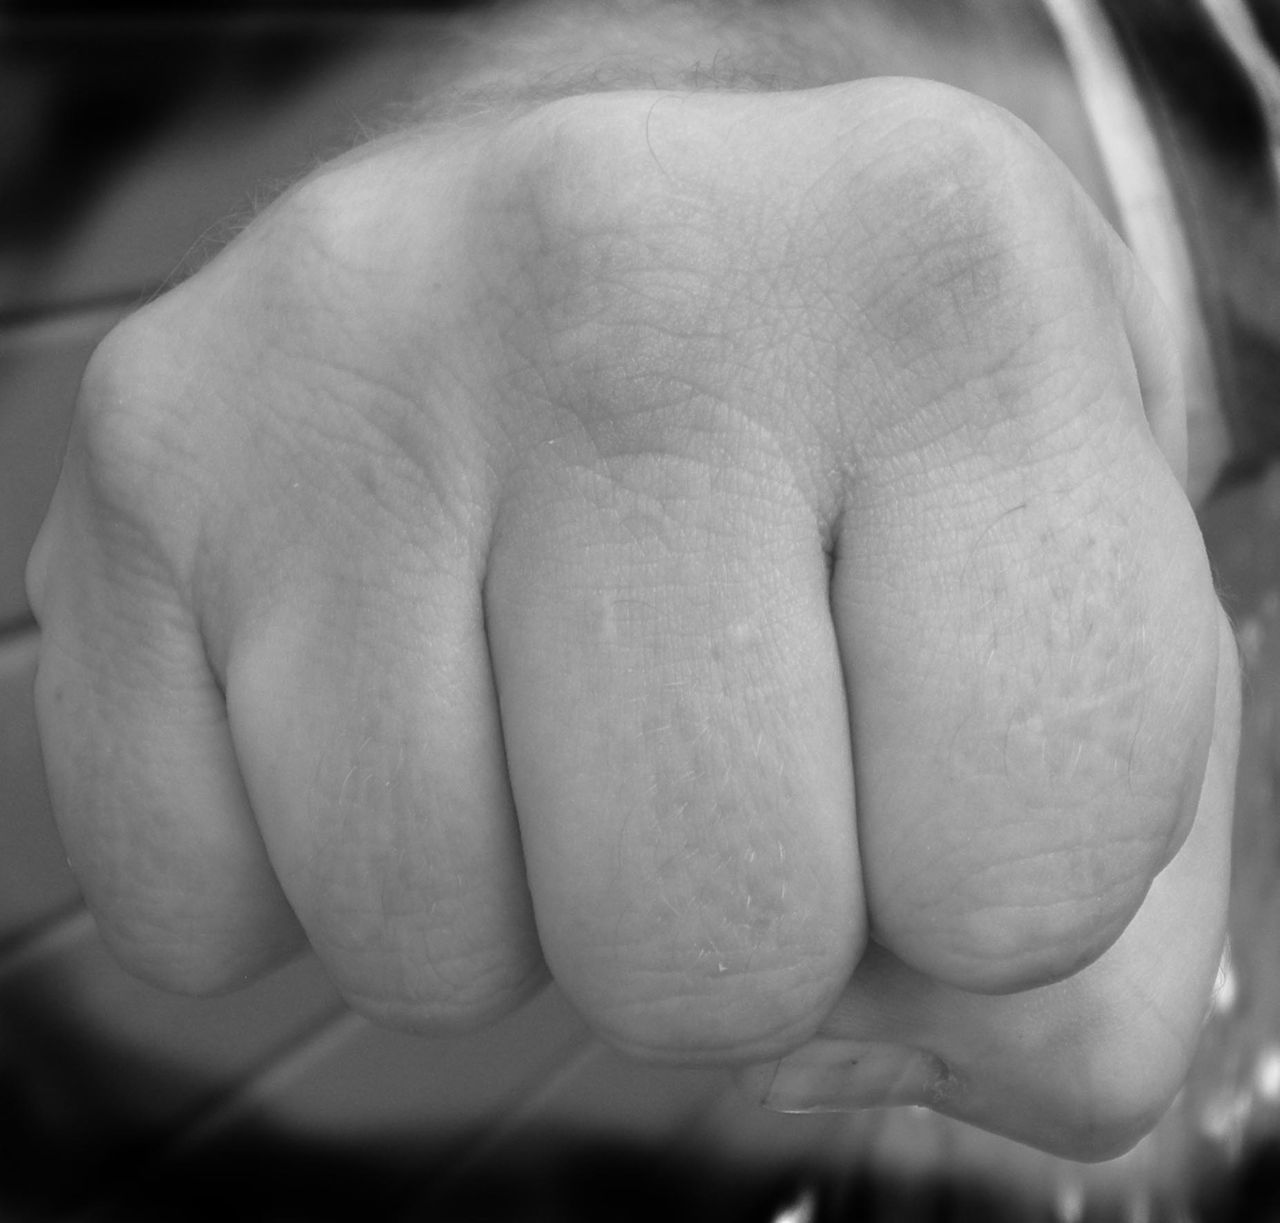 Русский кулак фото, ретро порно фильмы онлайн про лесби